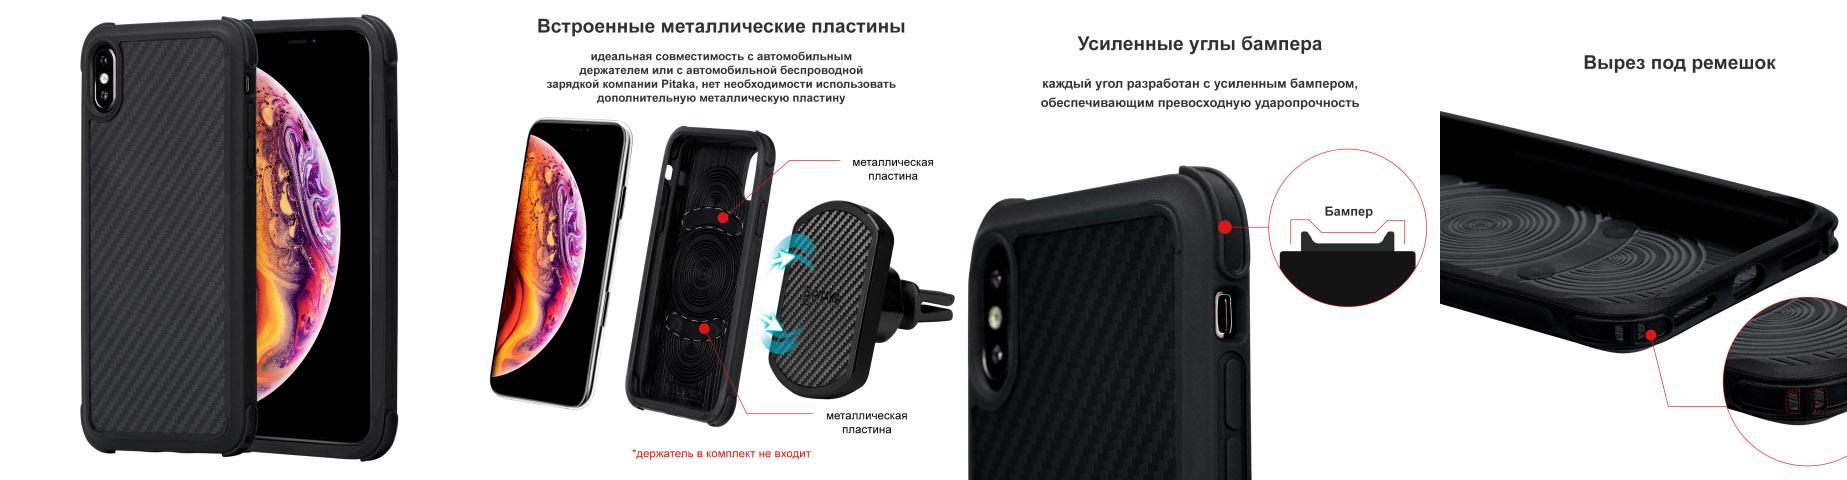 Pitaka MagCase black Pro